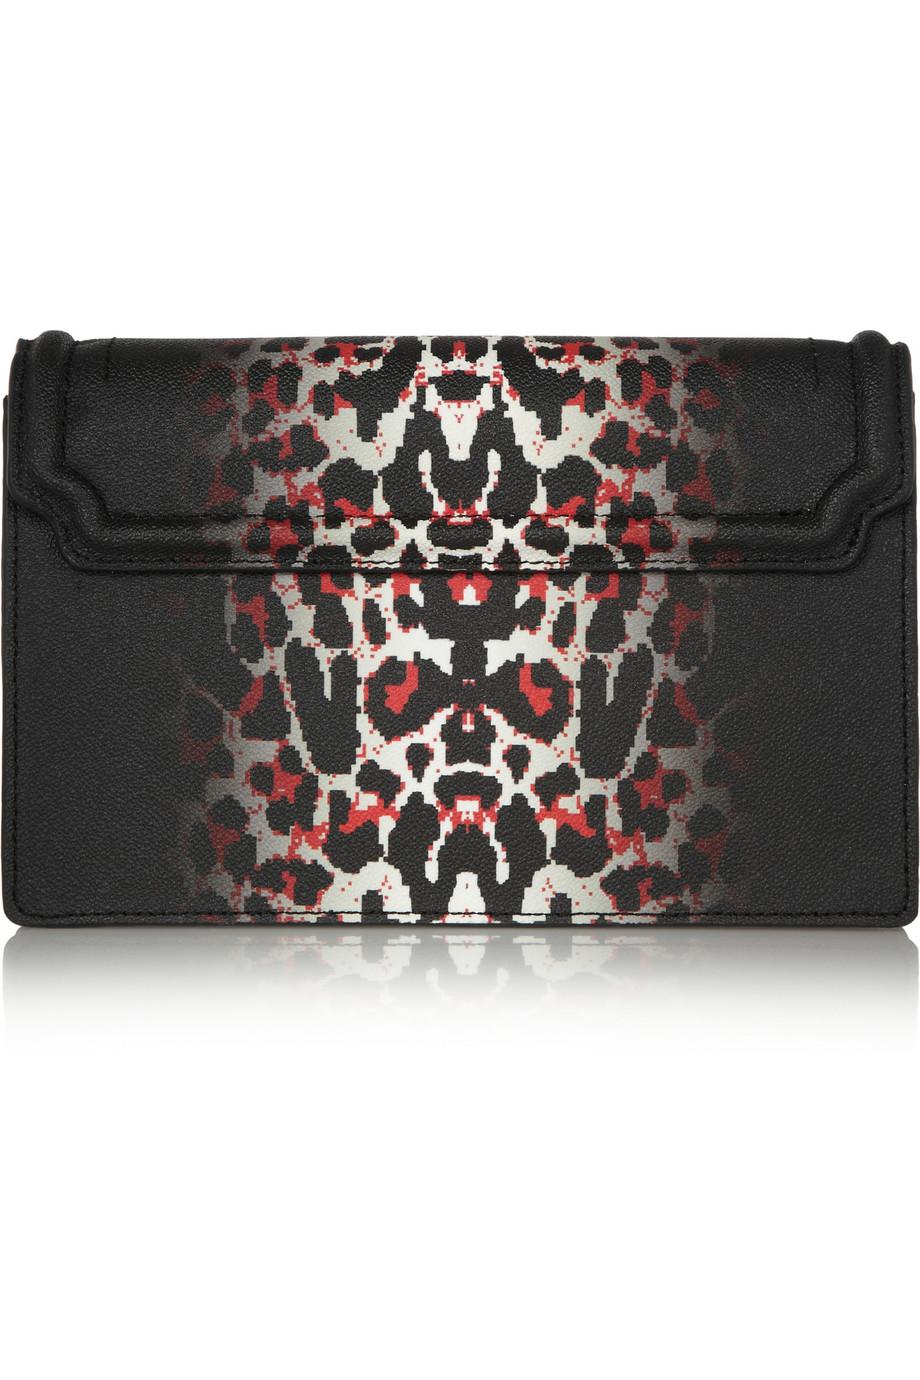 5871ea78c0d9 Lyst - McQ Simple Fold Leopard-Print Textured-Leather Shoulder Bag ...